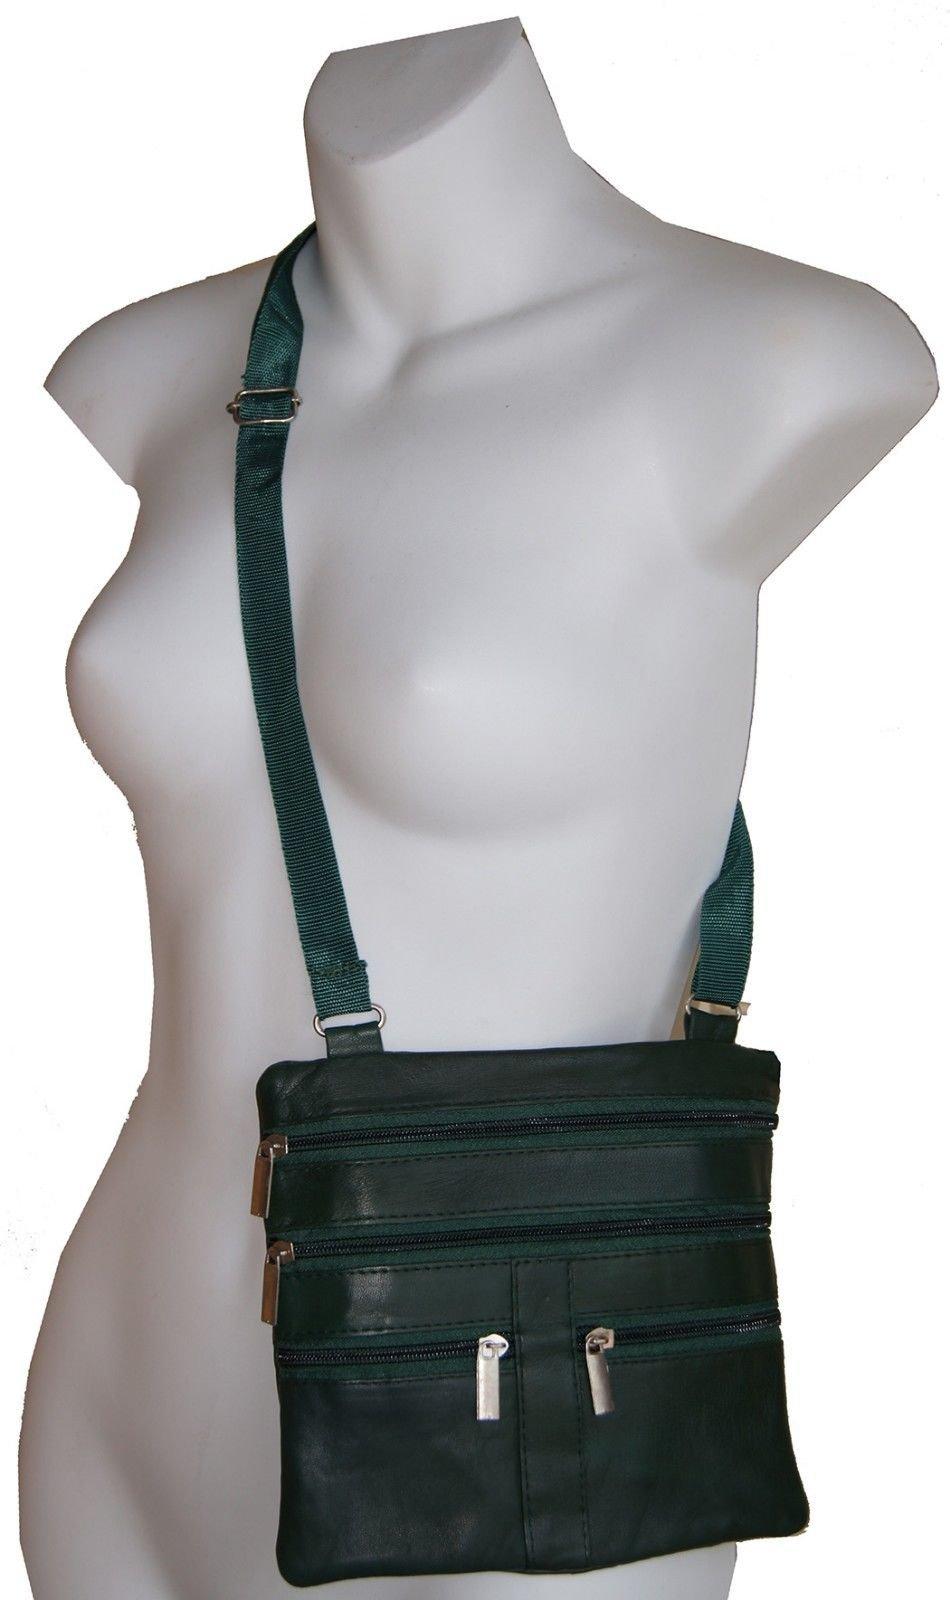 Green Ladies Genuine Leather Cross Body Bag Satchel Messenger Bag 48'' Strap